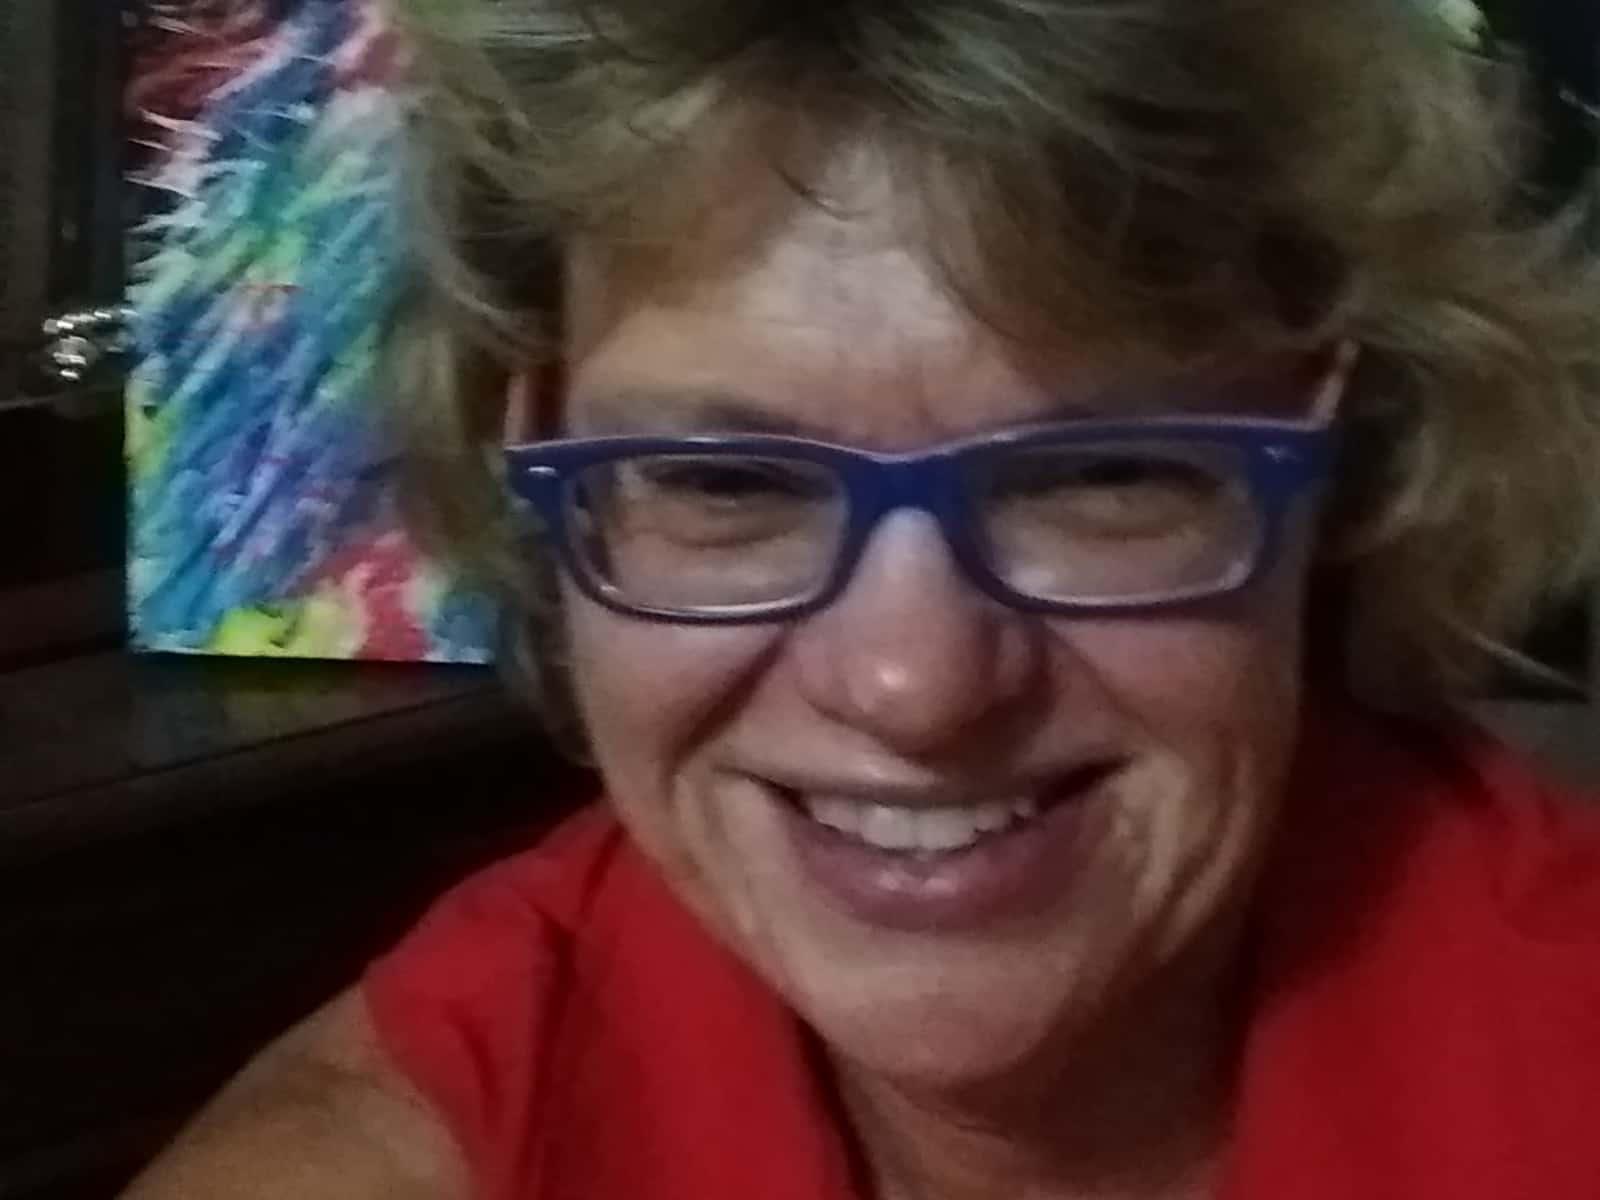 Wendy from Adelaide, South Australia, Australia